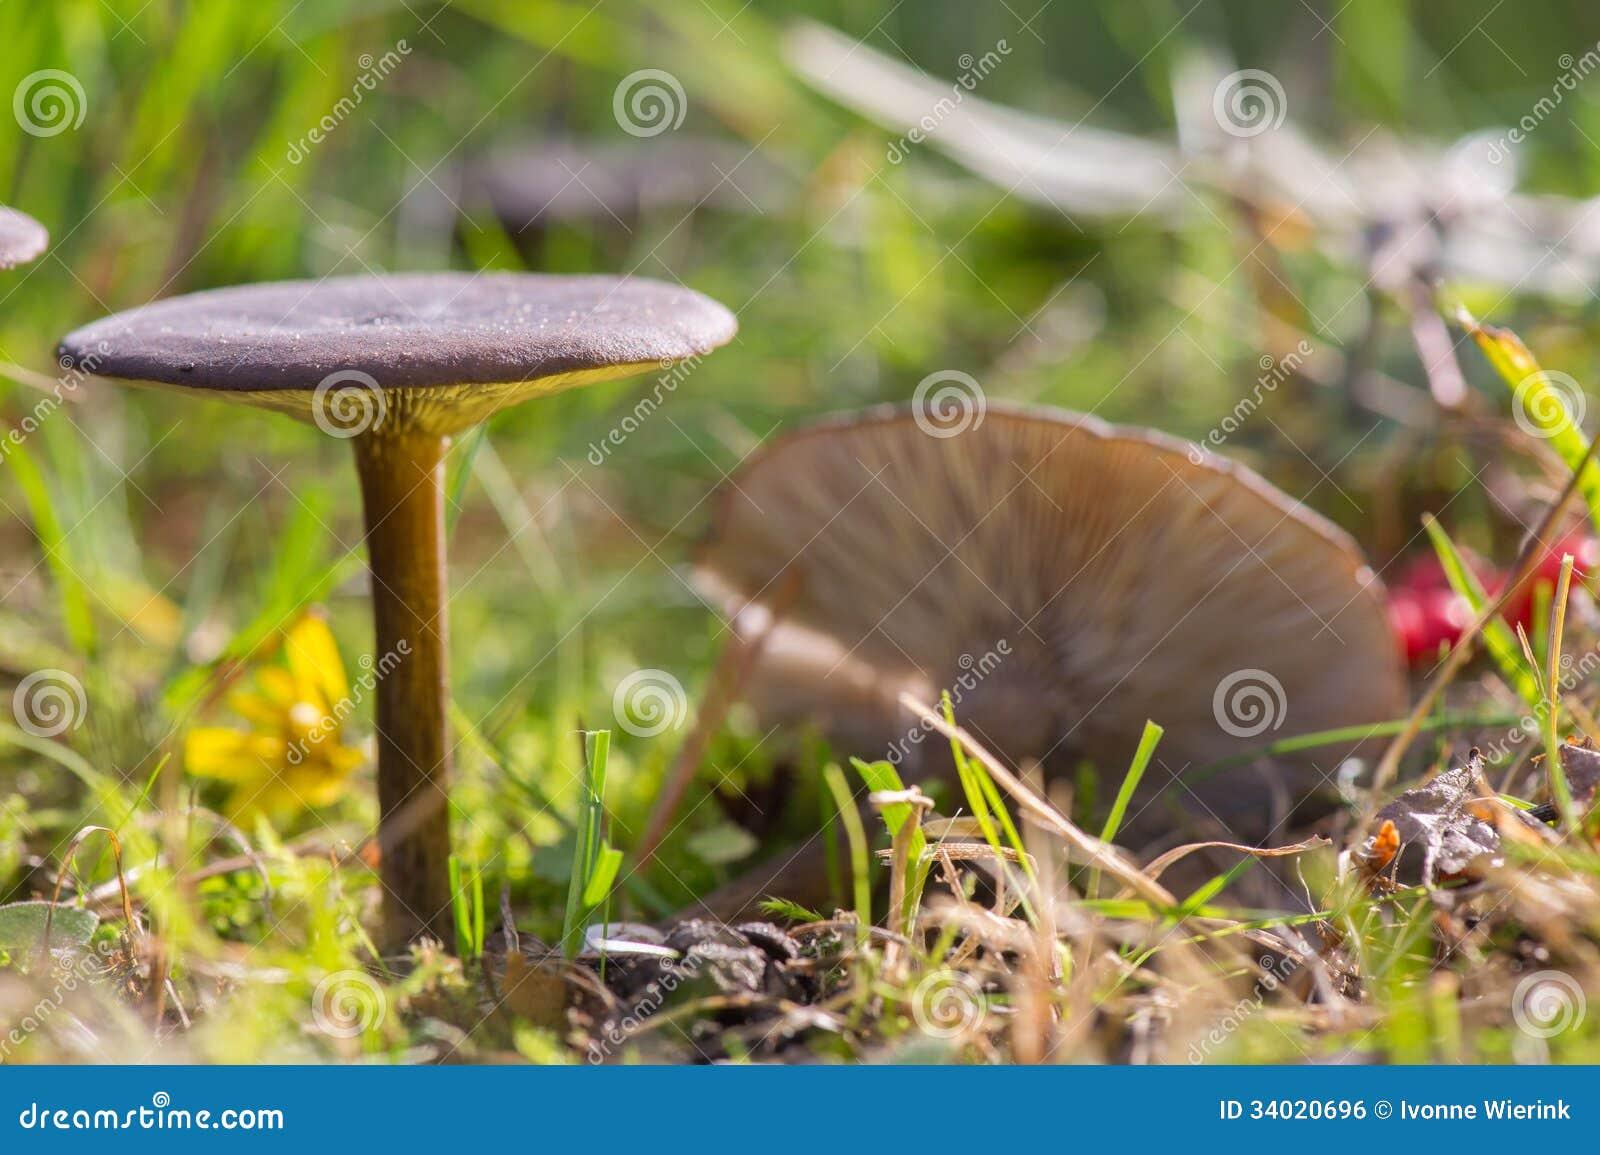 Group dark mushrooms